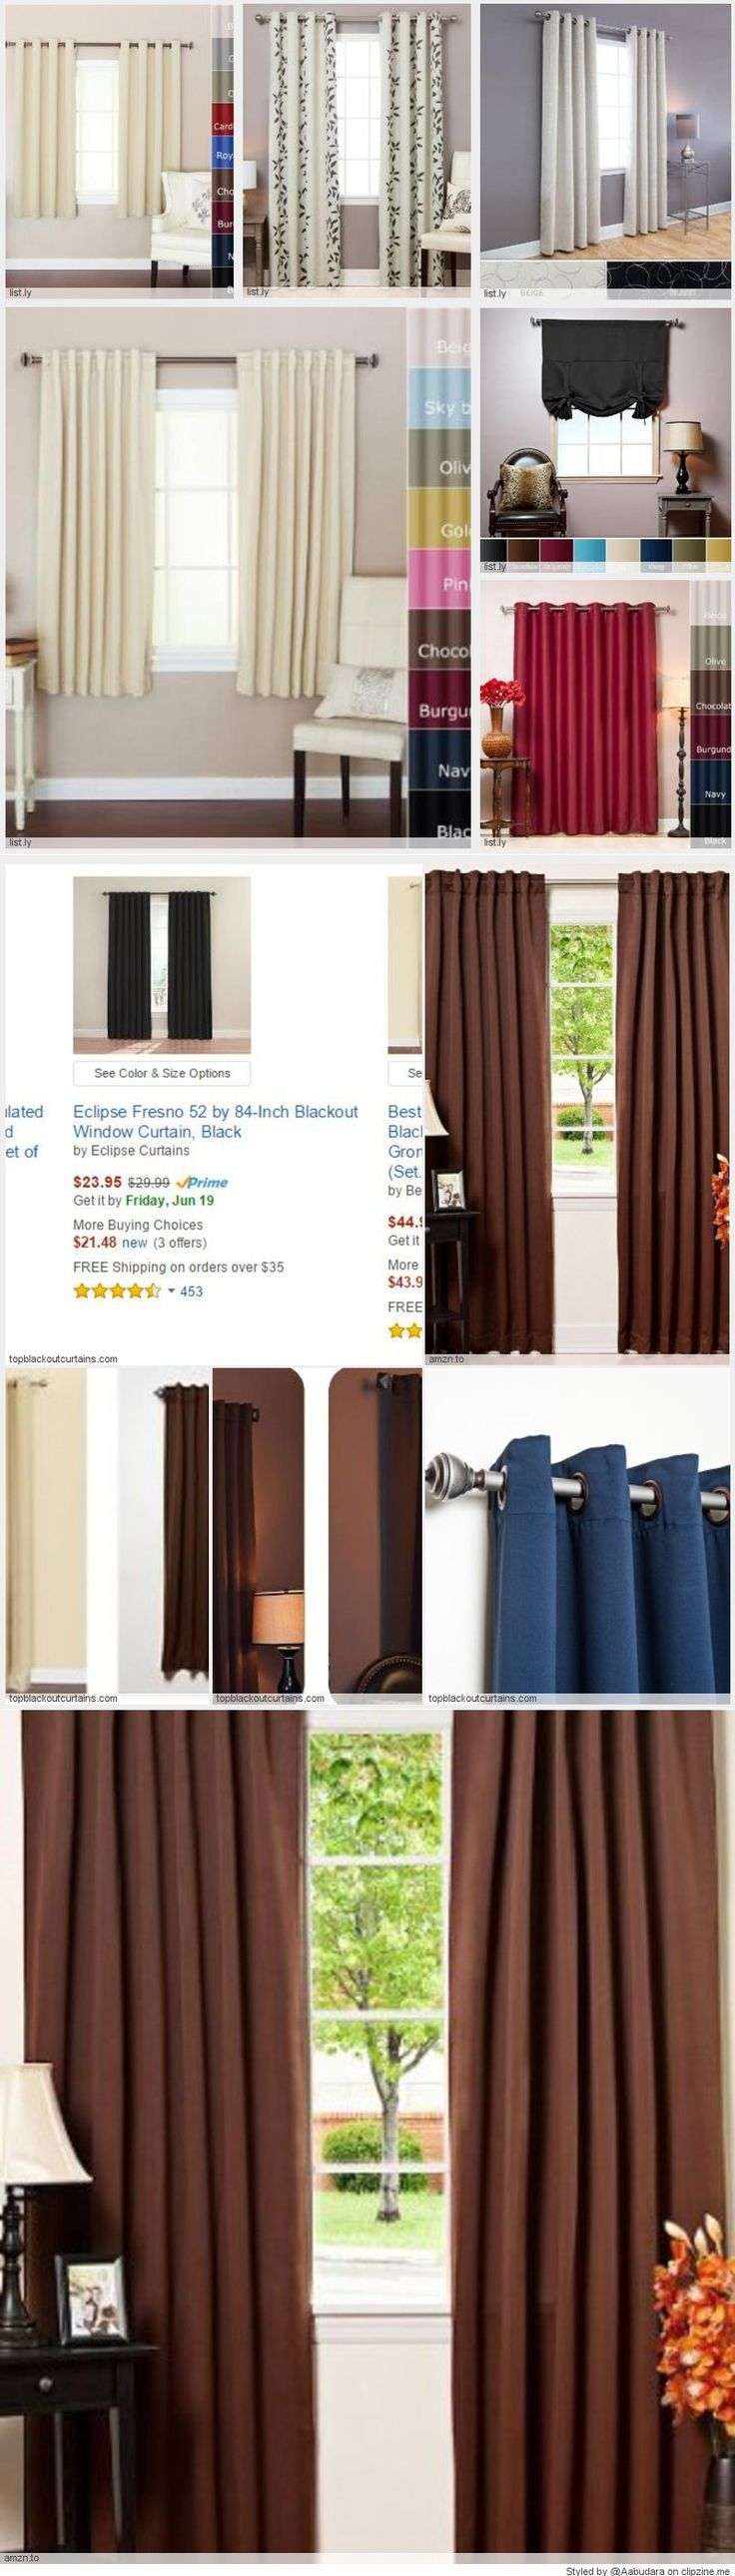 Best 25 blackout curtains ideas on pinterest bedroom blackout curtains window curtains and for Best blackout shades for bedroom